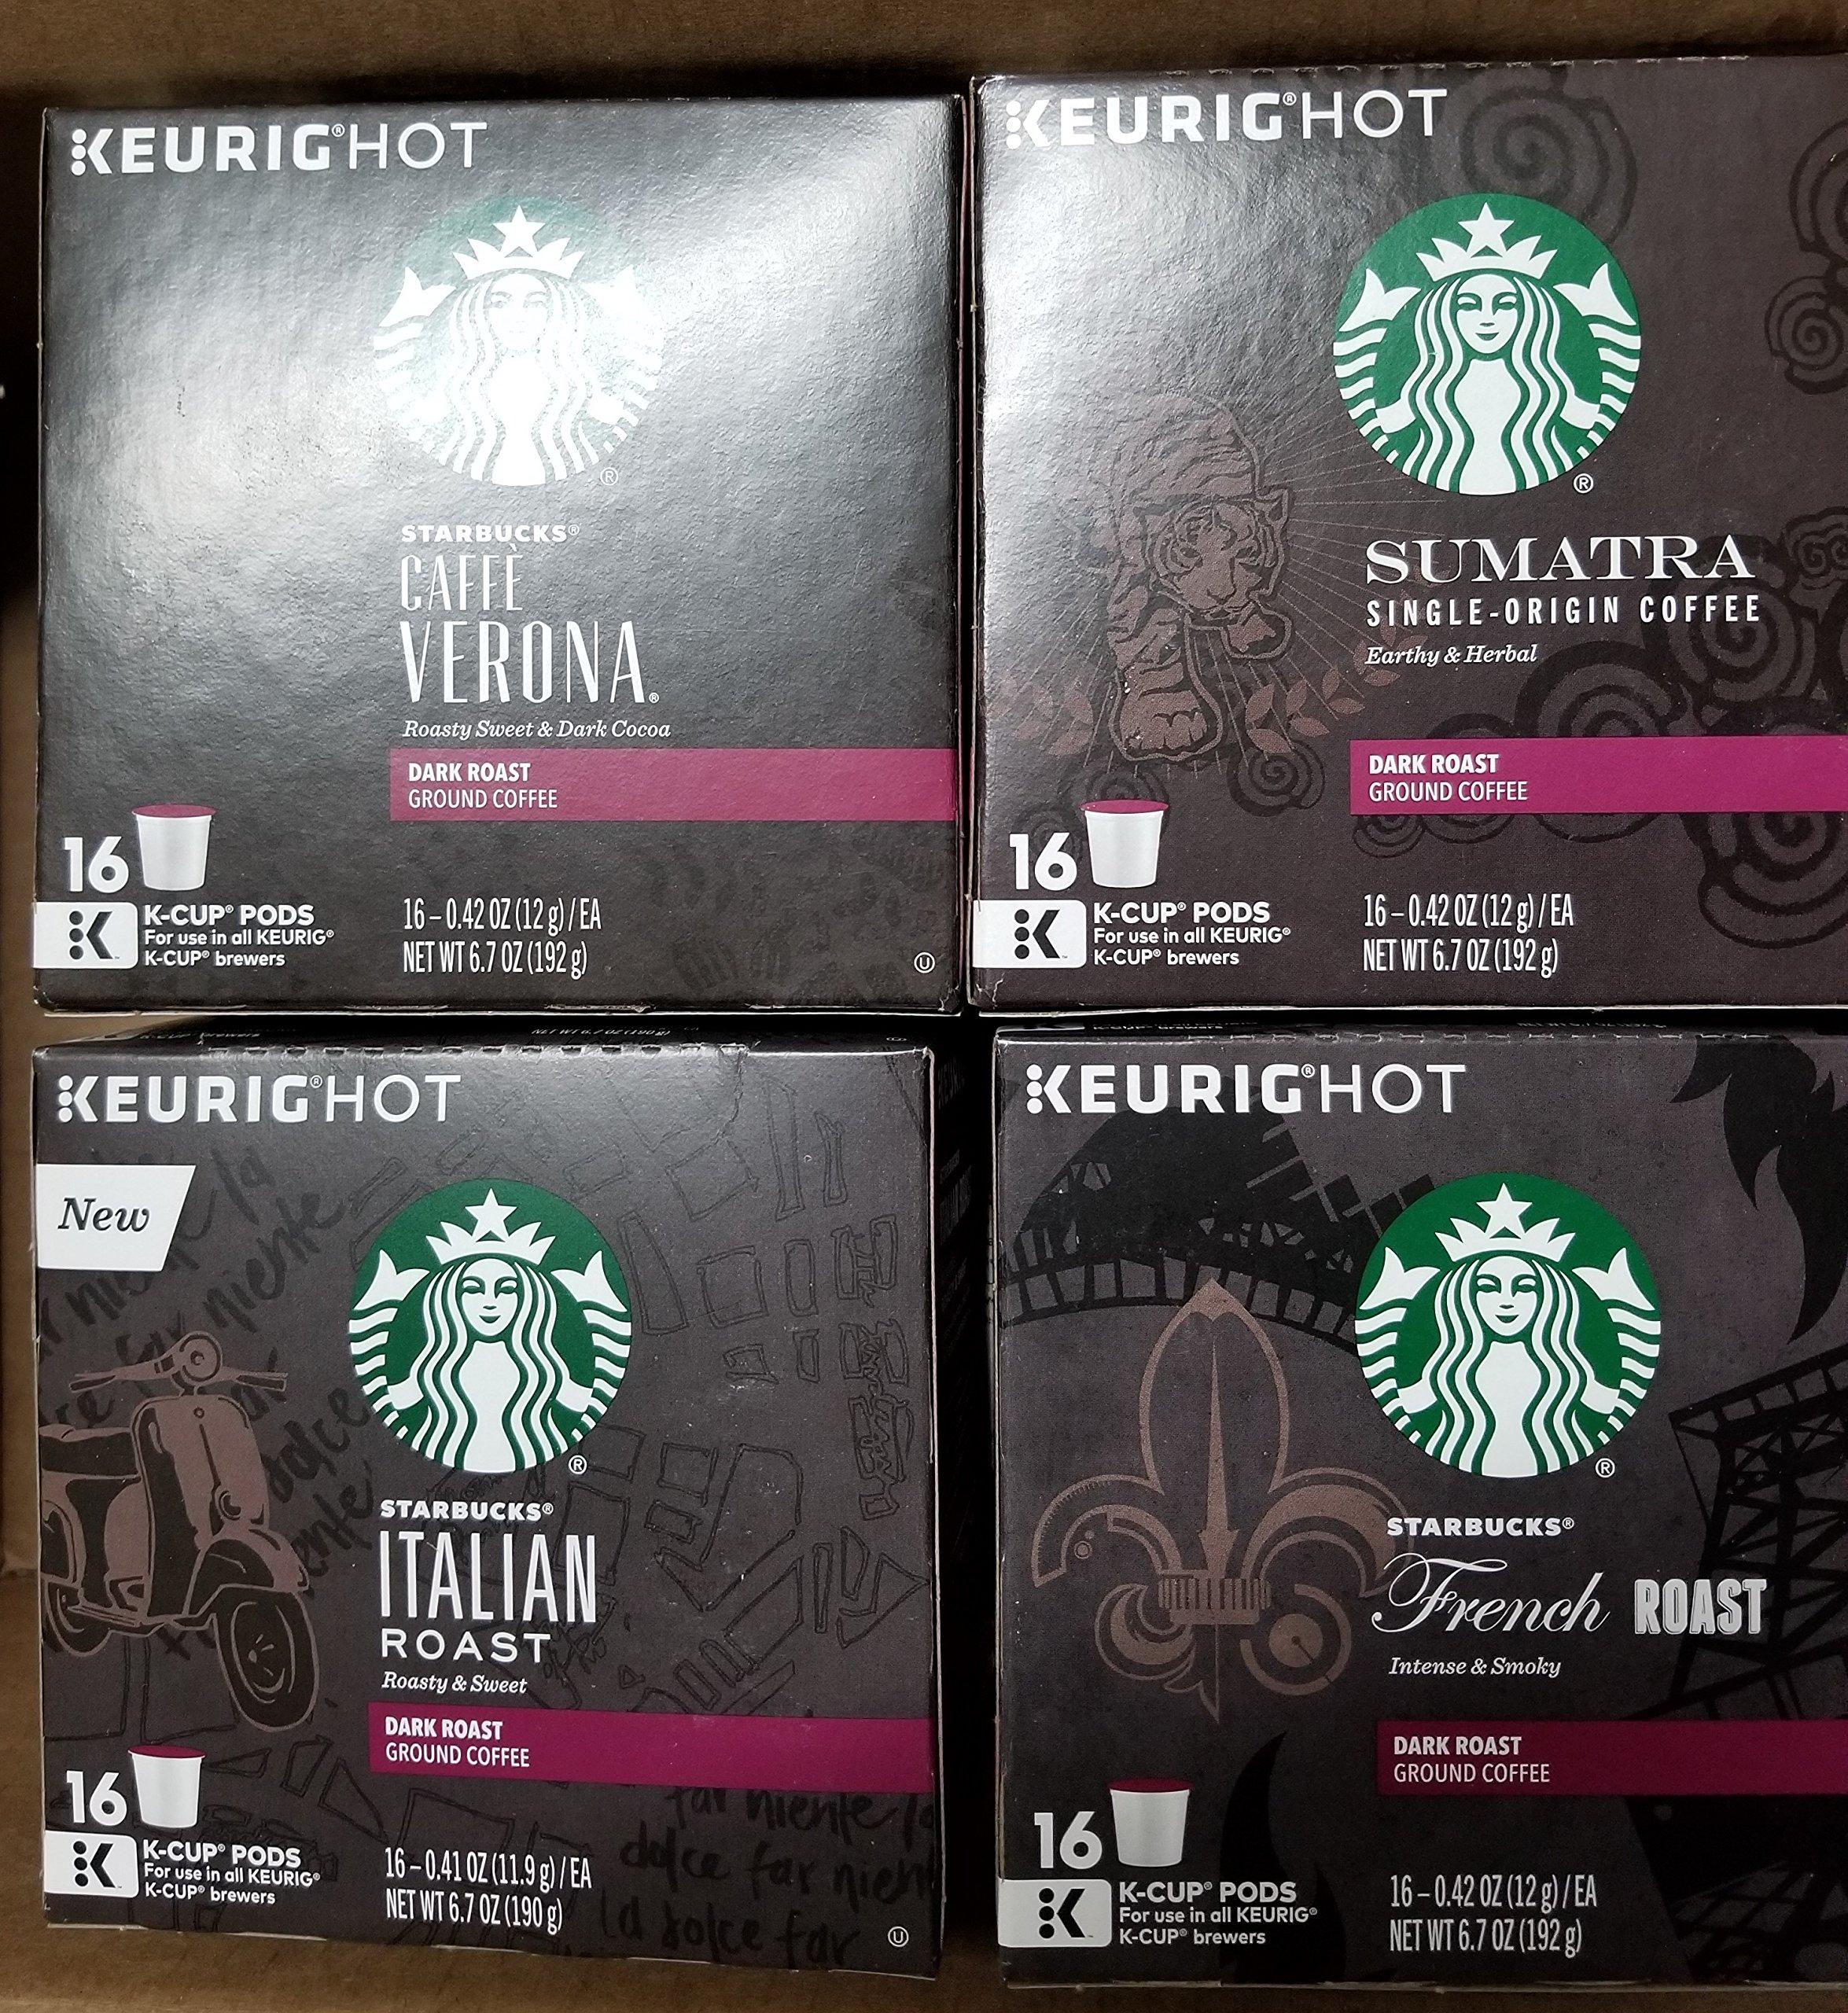 Starbucks Dark Roast Variety Pack 128Ct K-Cup Pods(French Roast- Italian Roast- Caffè Verona-Sumatra )